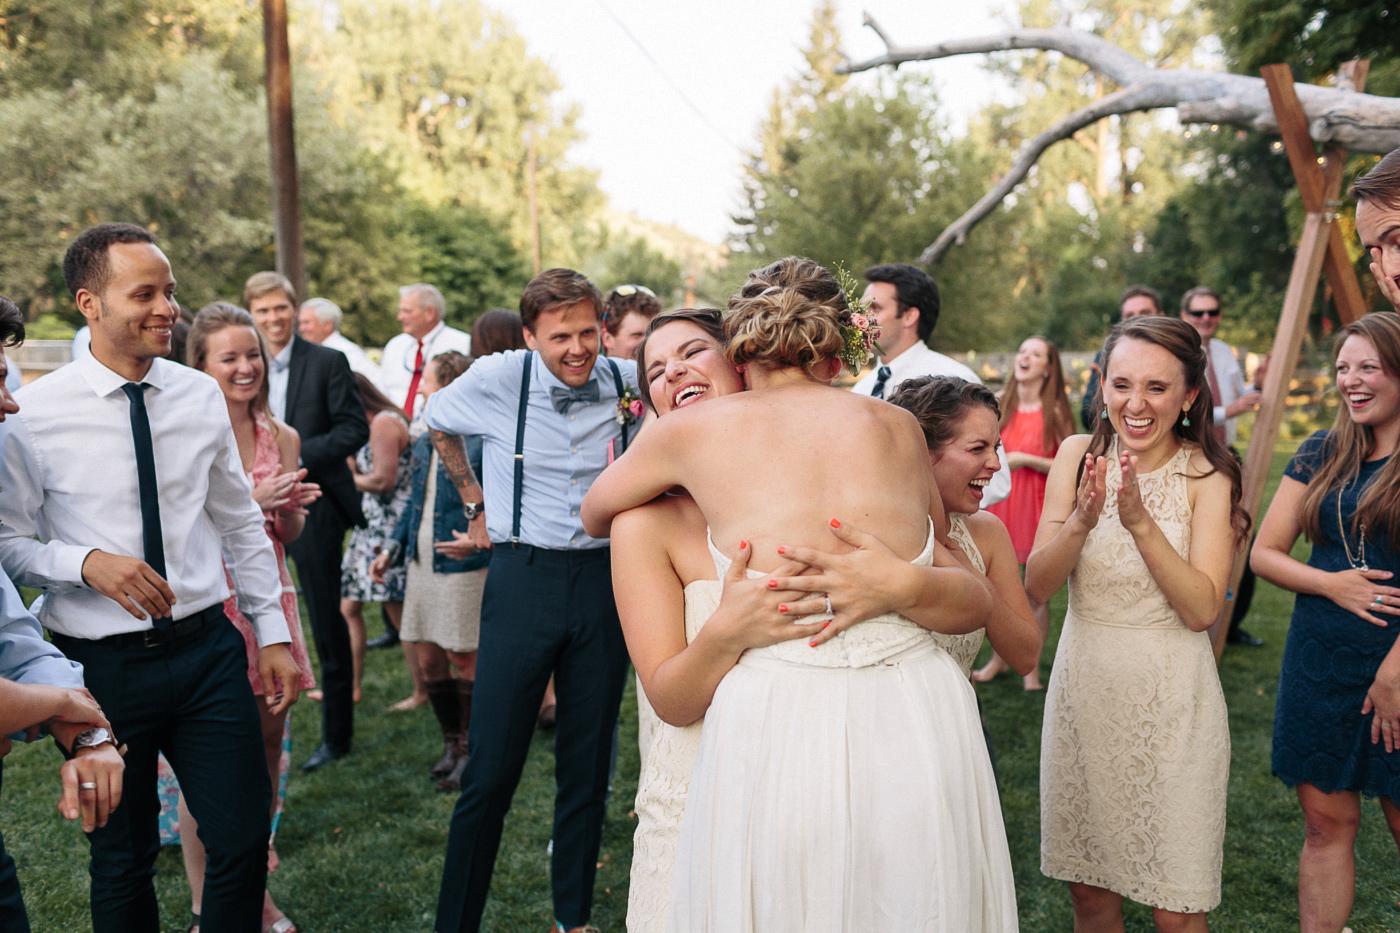 Lyons-Farmette-Wedding-Photographer-Lucy-Austin-Flash-Mob-Dance-56.jpg